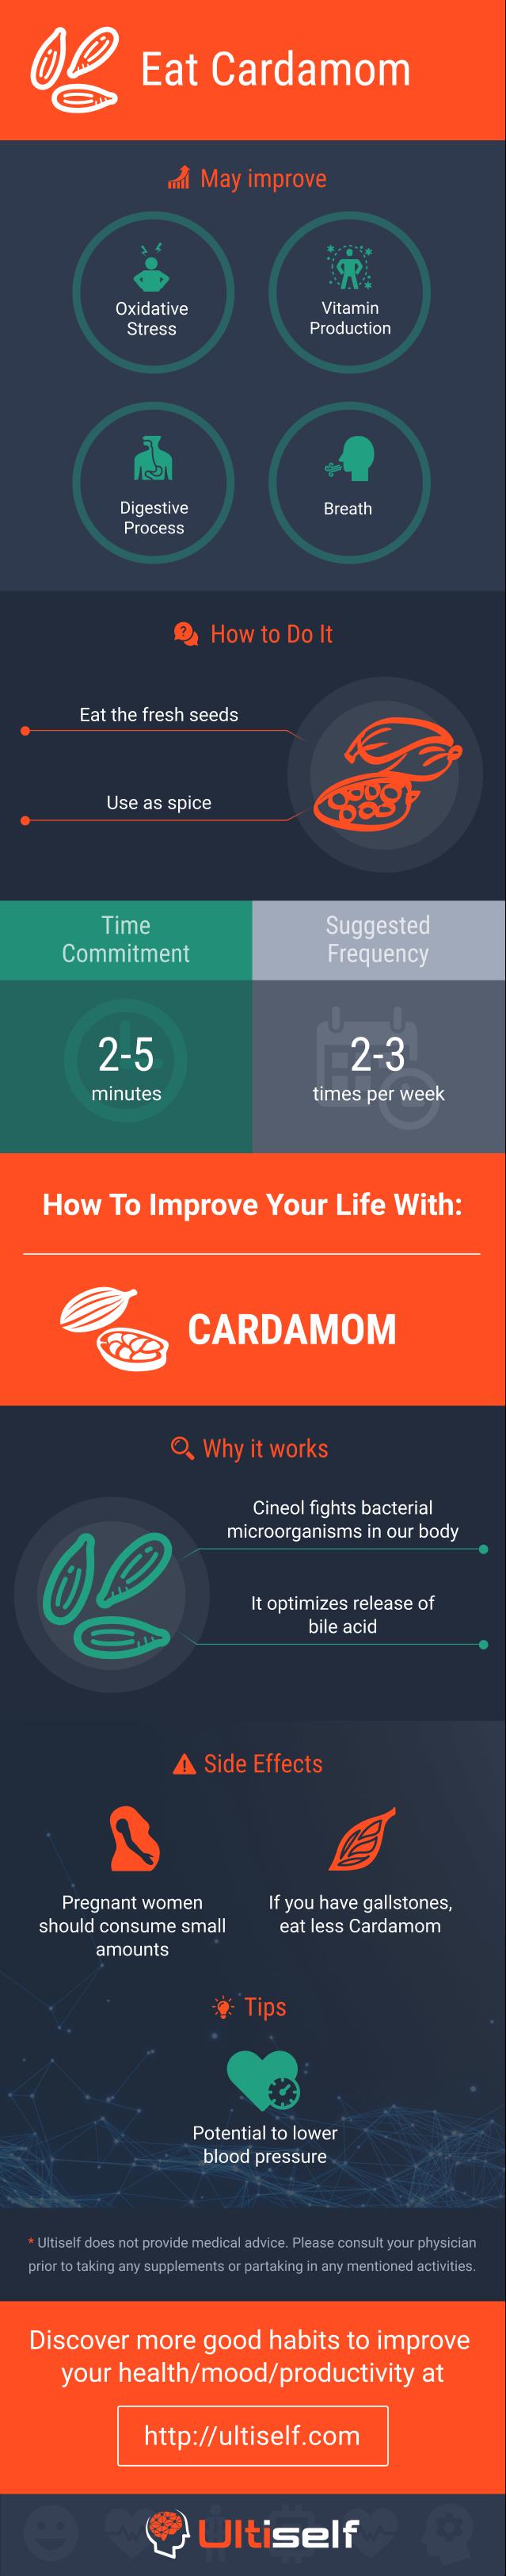 Eat Cardamom infographic